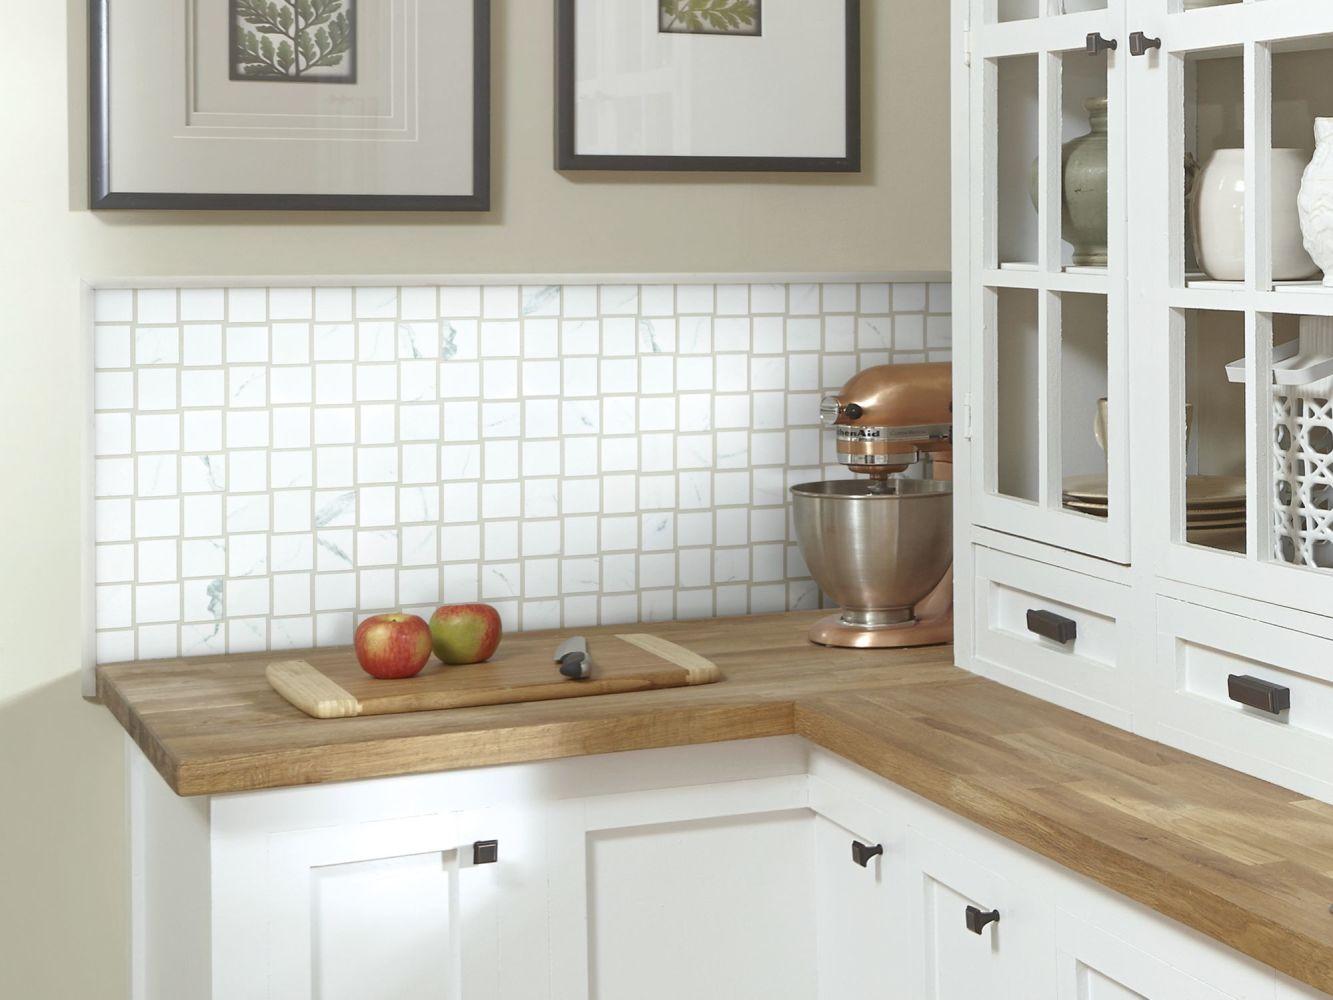 Shaw Floors Home Fn Gold Ceramic Stonehenge Bw Mosaic Plsh Statuario 00151_TG50D